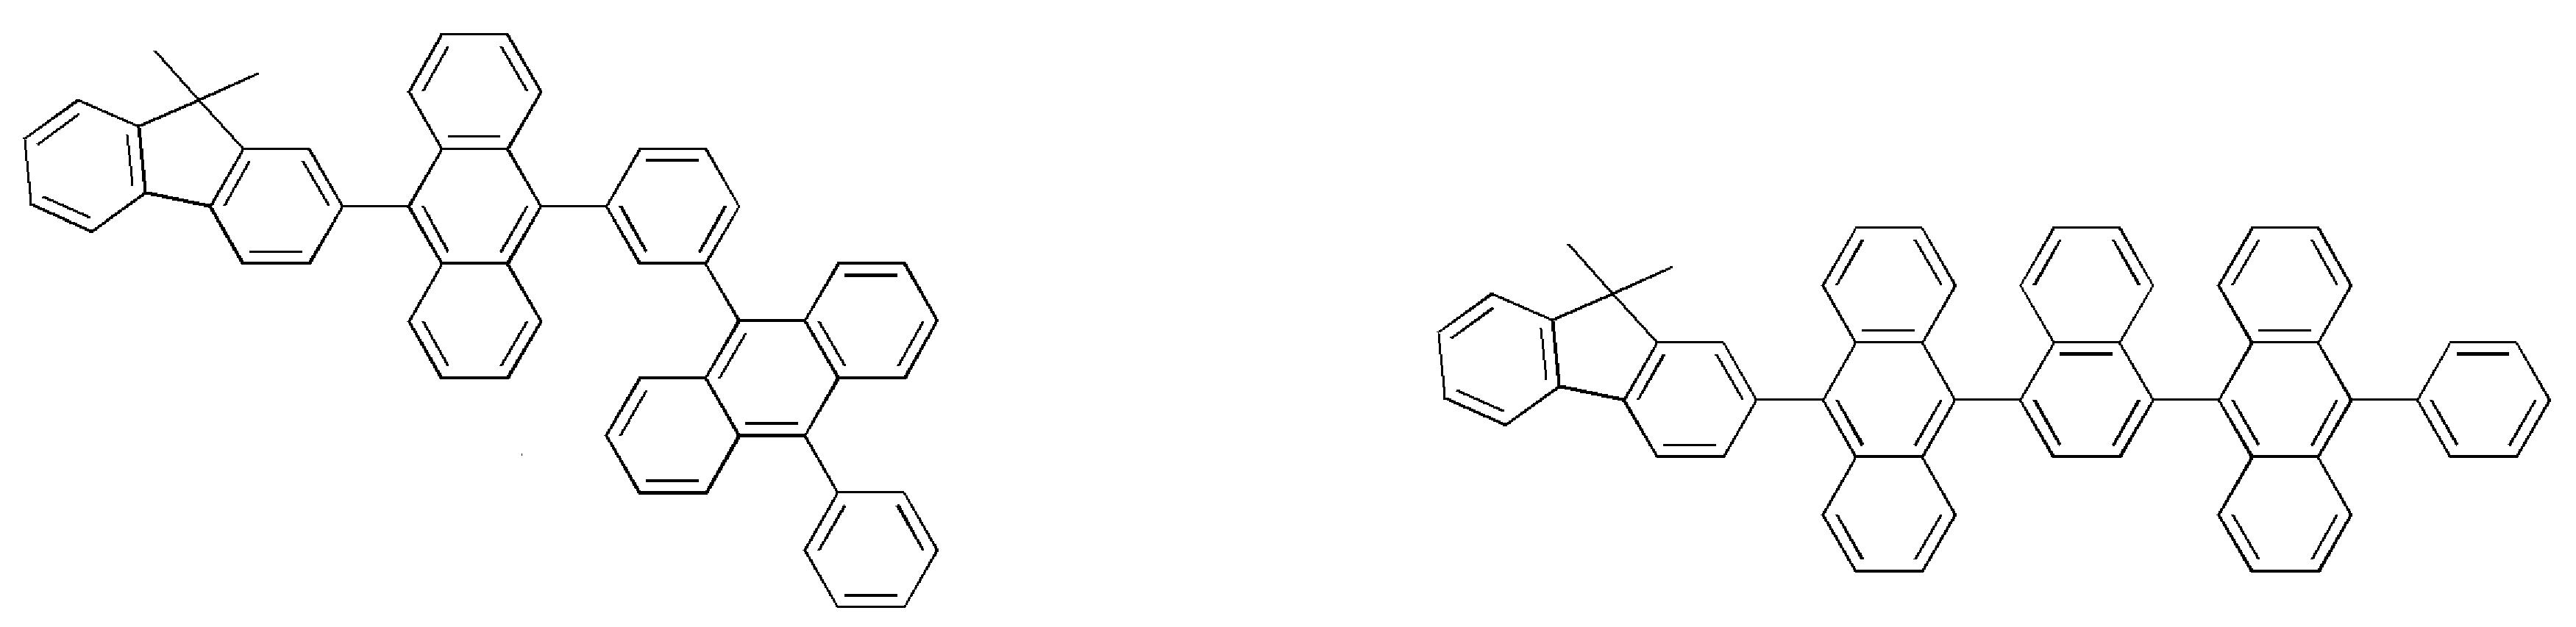 Figure 112007083008831-pat00583